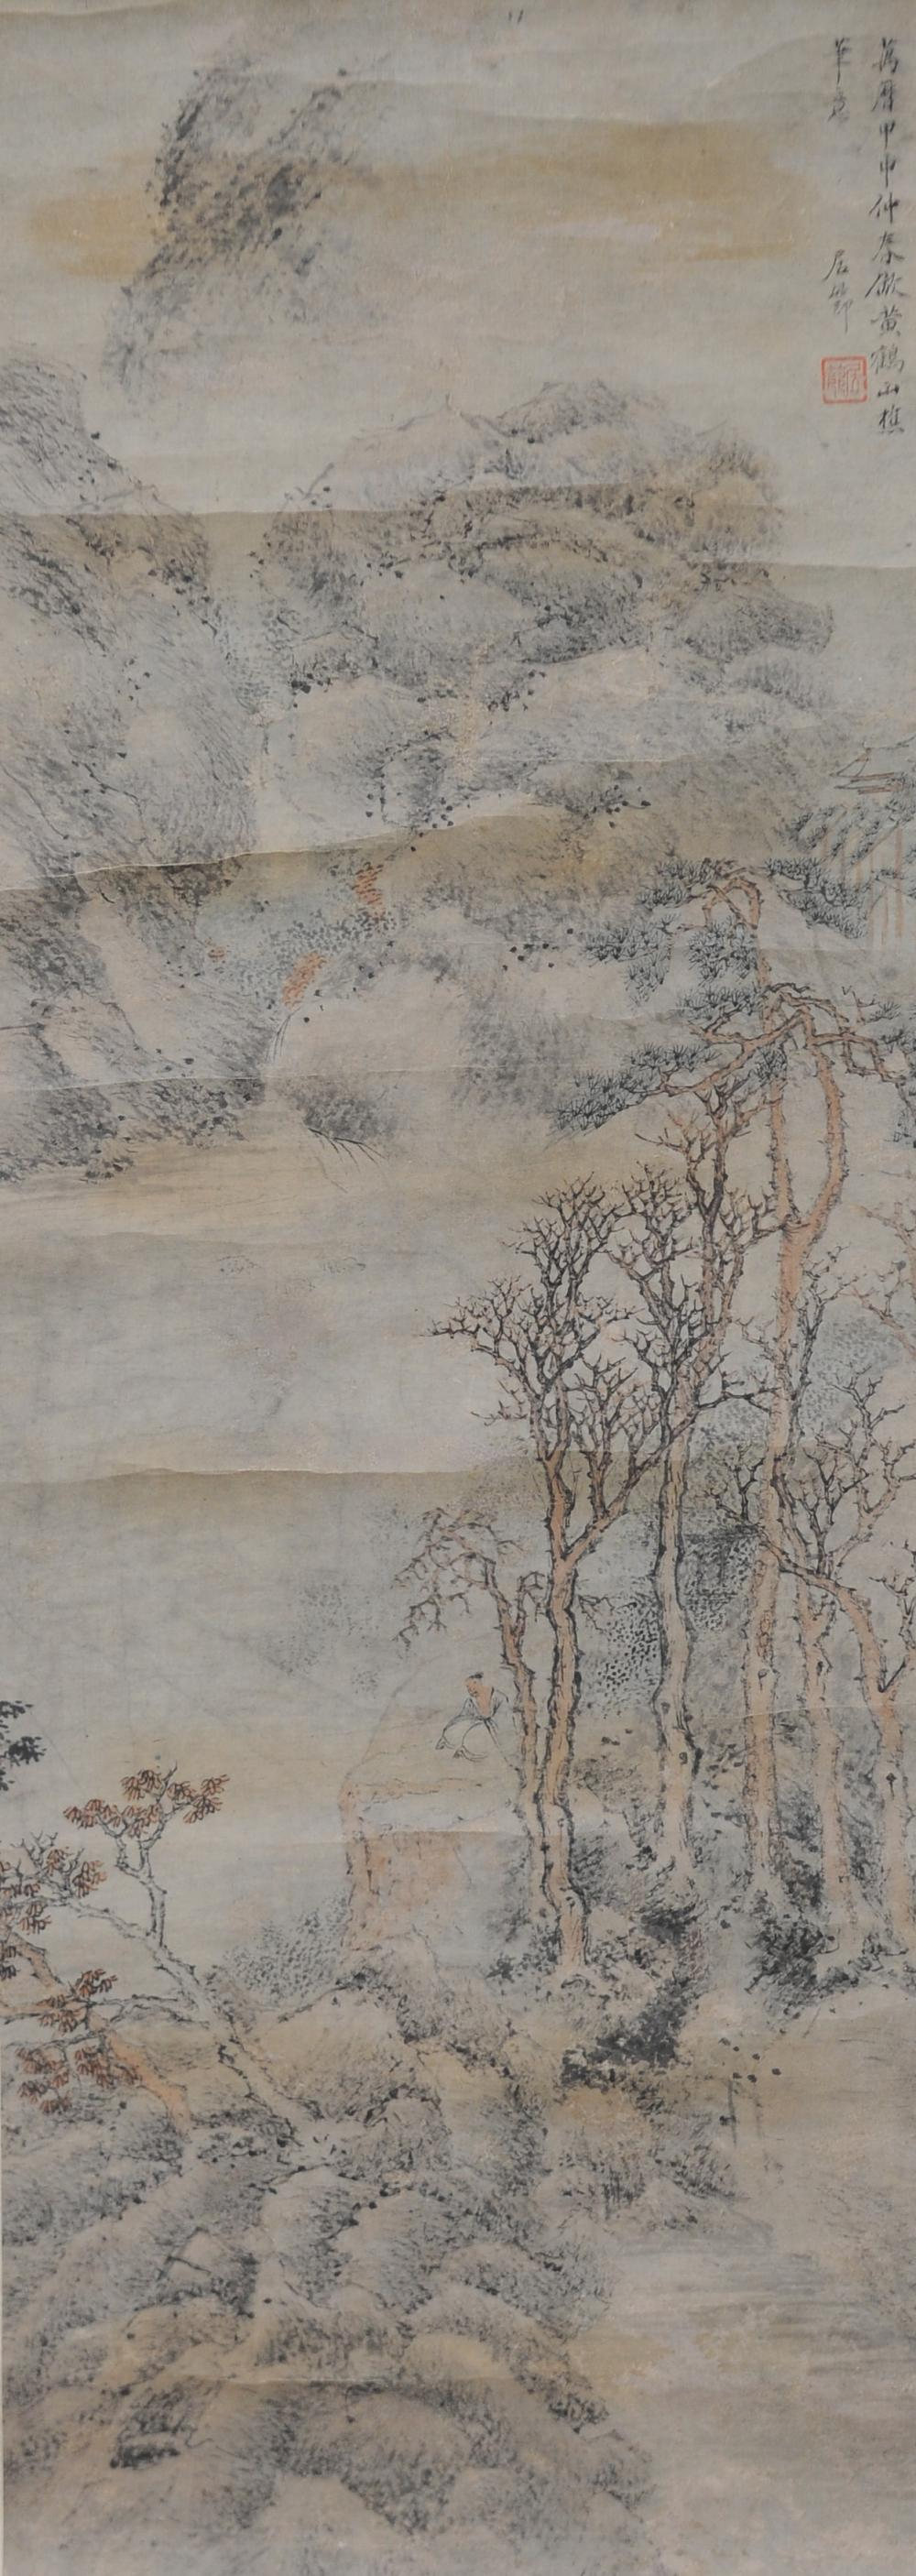 LANDSCAPE PAINTING BY JU JIE, MING DYNASTY